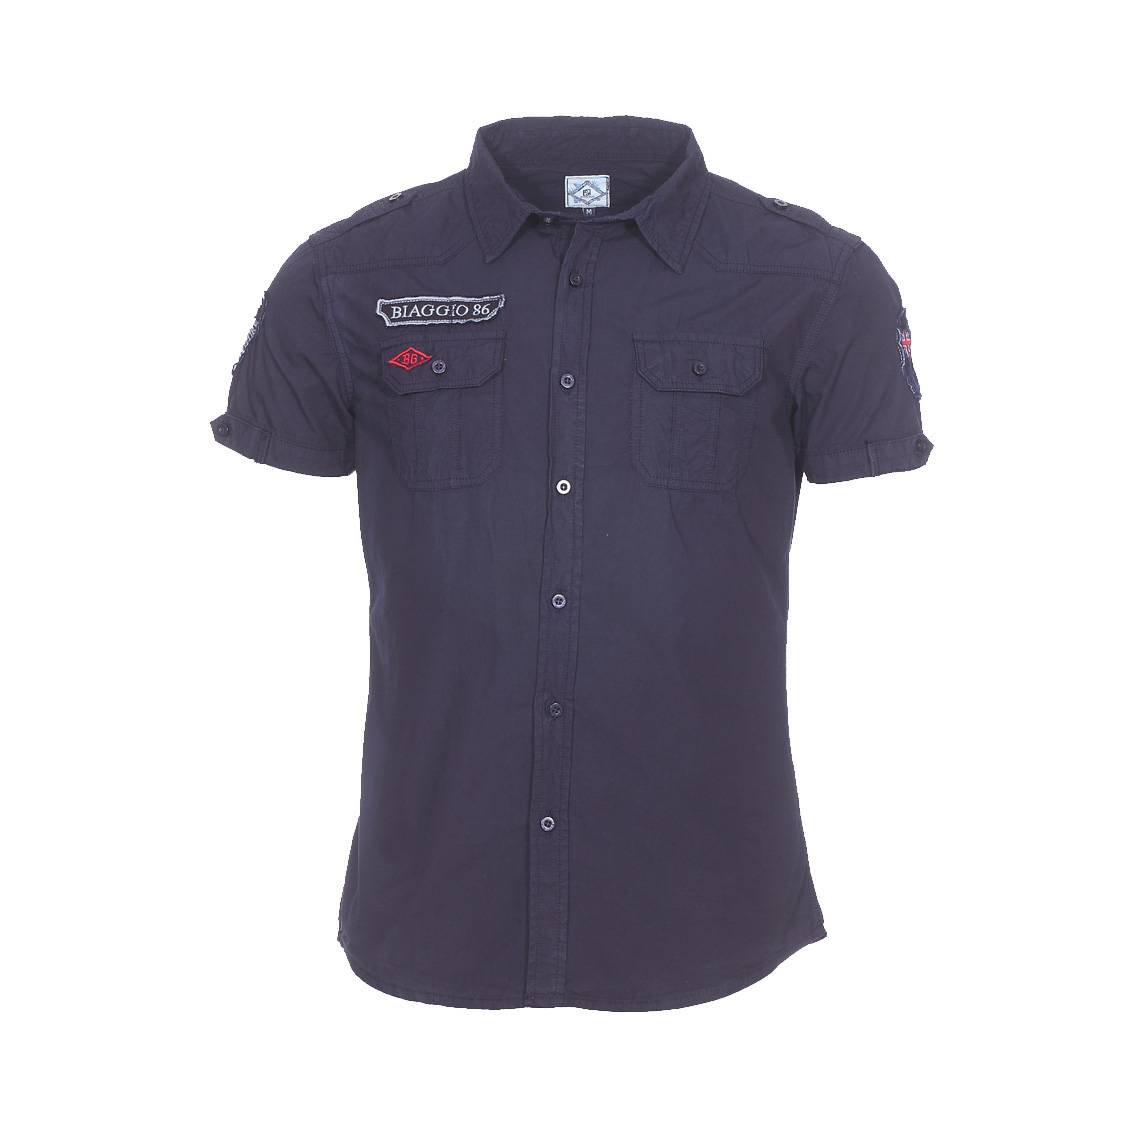 Chemise manches courtes  conleta en coton bleu marine army